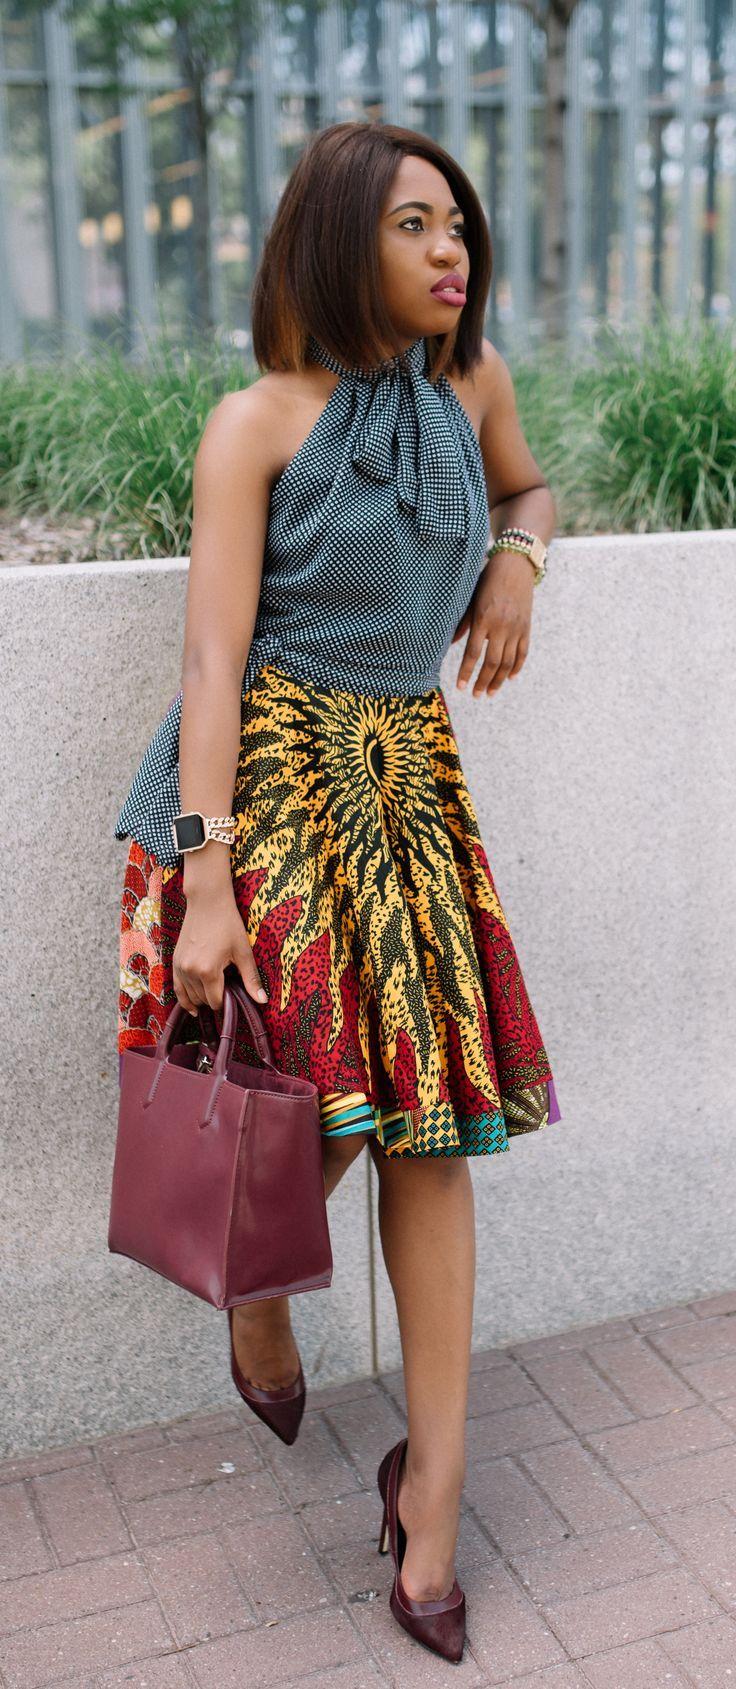 Best 25+ African attire ideas on Pinterest   African wear dresses ...